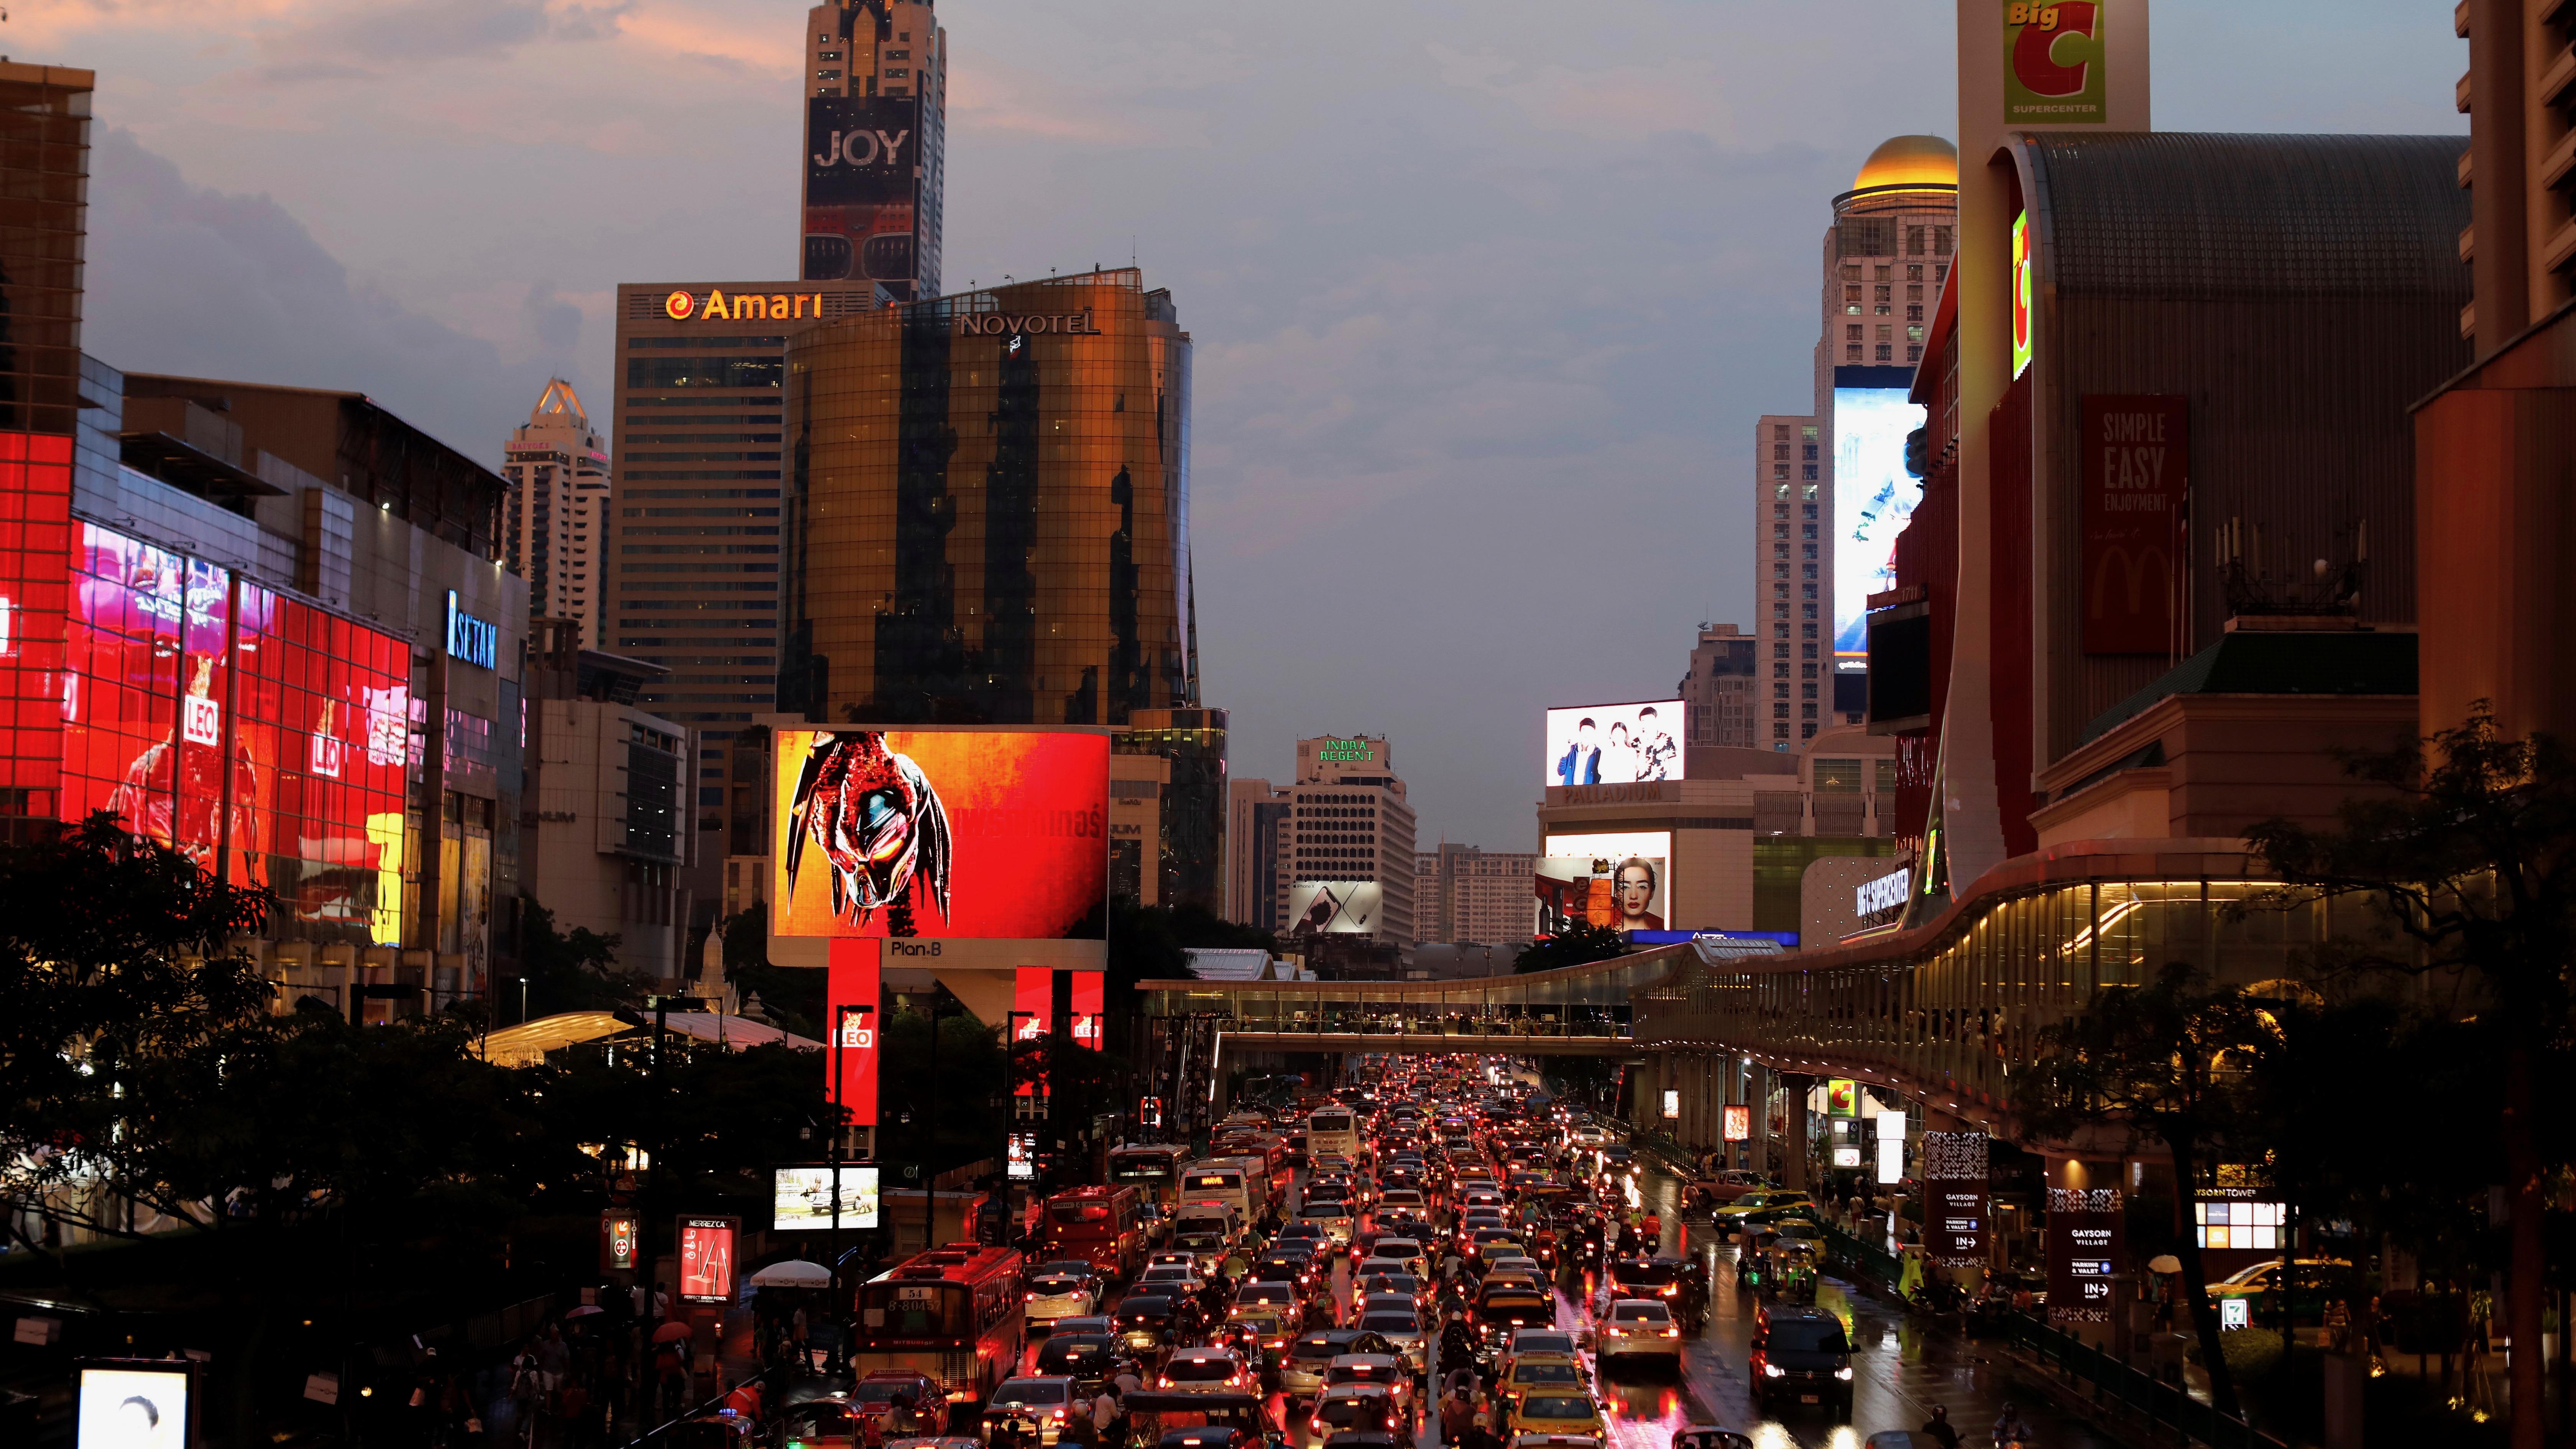 Electric vehicles would make Bangkok's rush hour a bit less noxious.